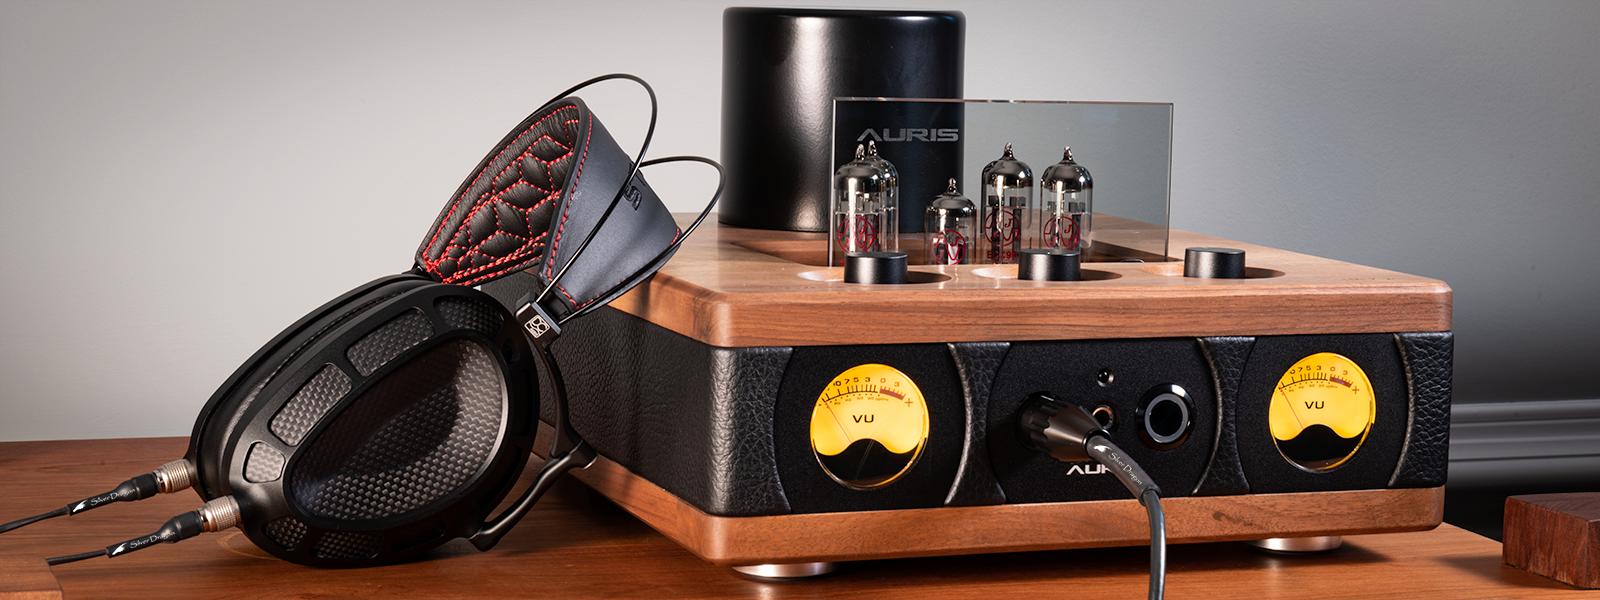 Dan Clark Audio Stealth headphone with Silver Dragon Premium headphone cable and HA - 2SF Amplifier by Auris Audio